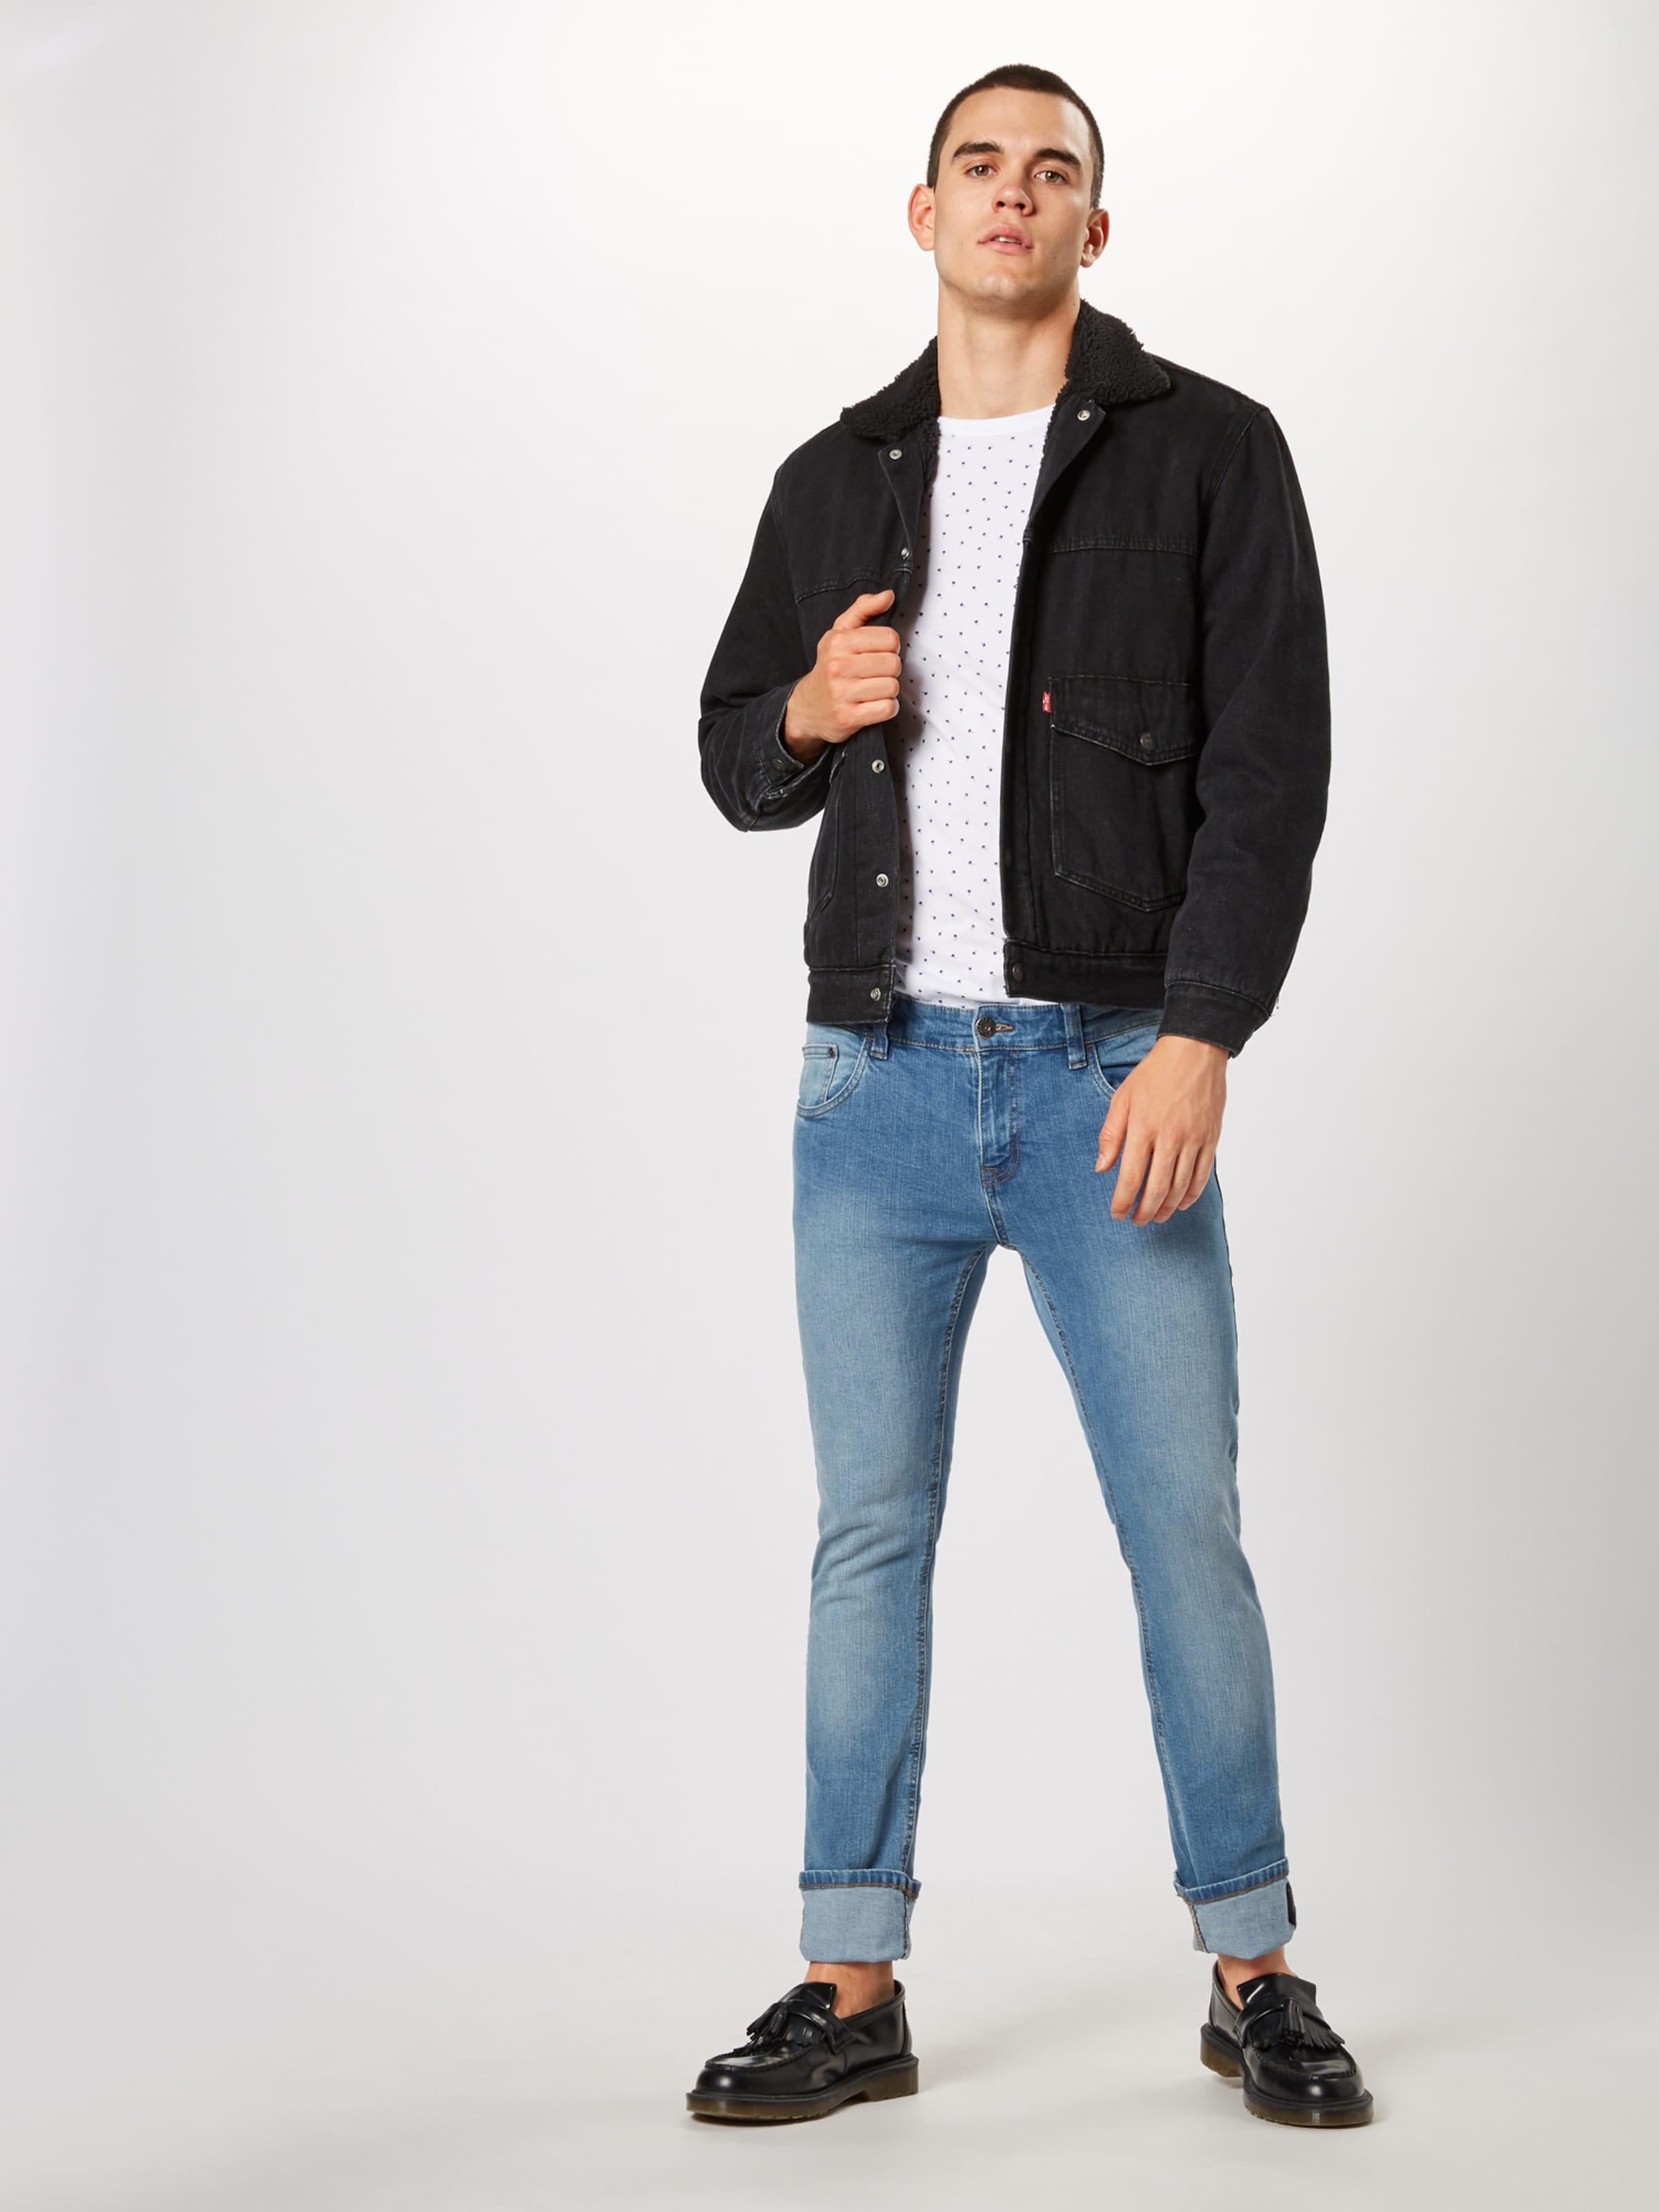 Indicode Clair Bleu Jeans 'pitsburg' Jean En VpLjqSUMGz